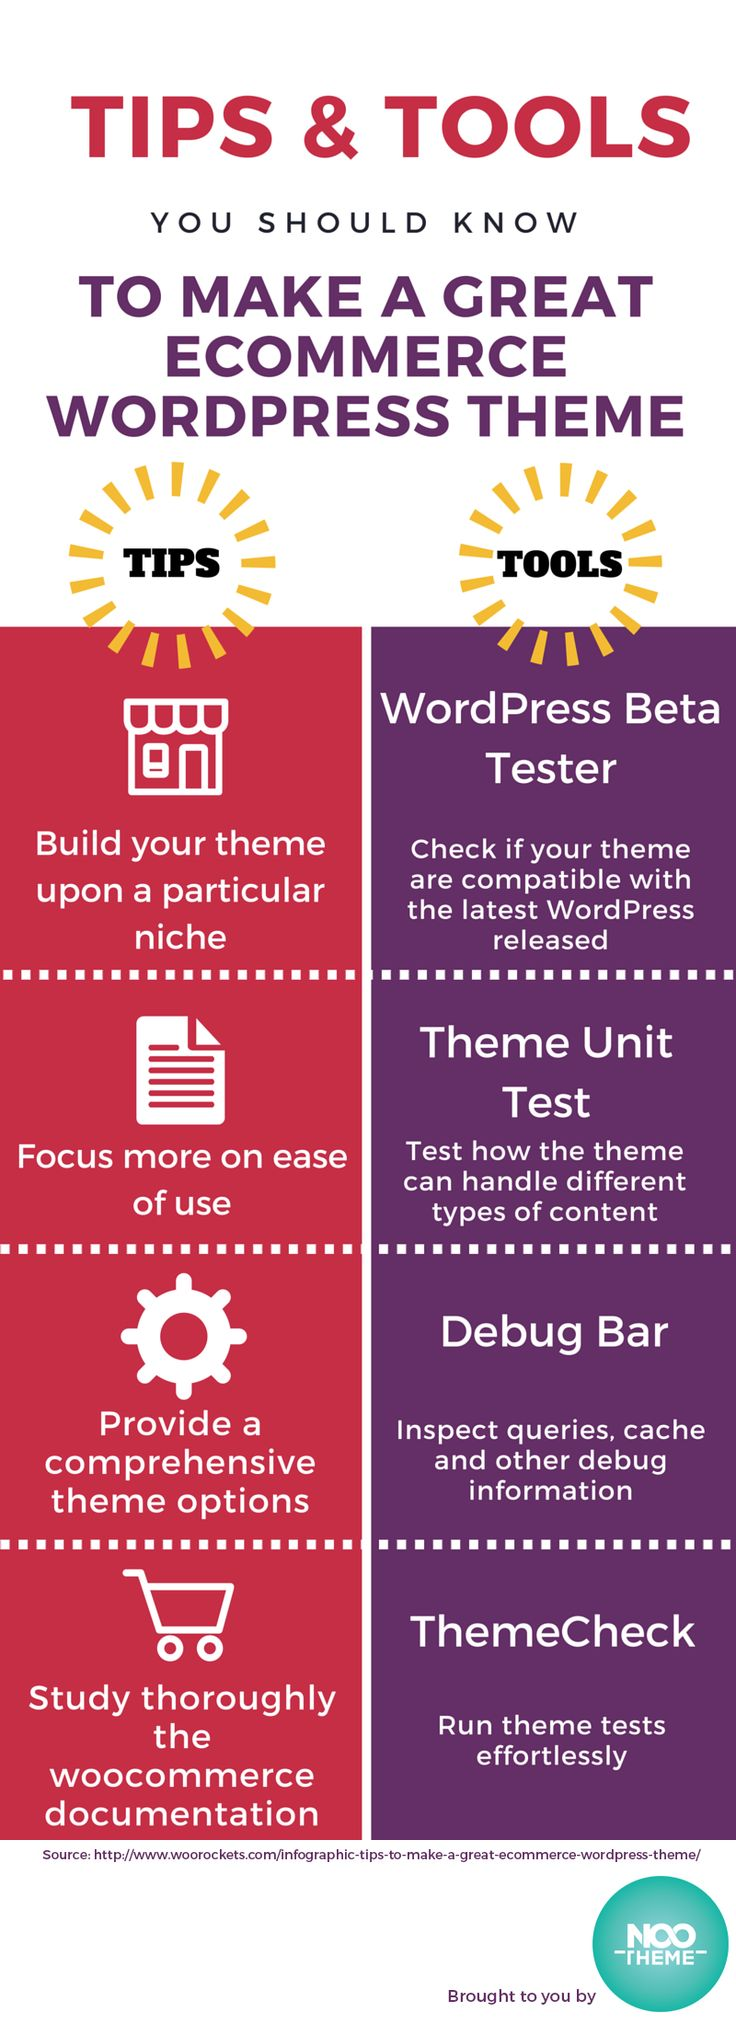 7 best web design images on Pinterest | Wordpress theme, Templates ...